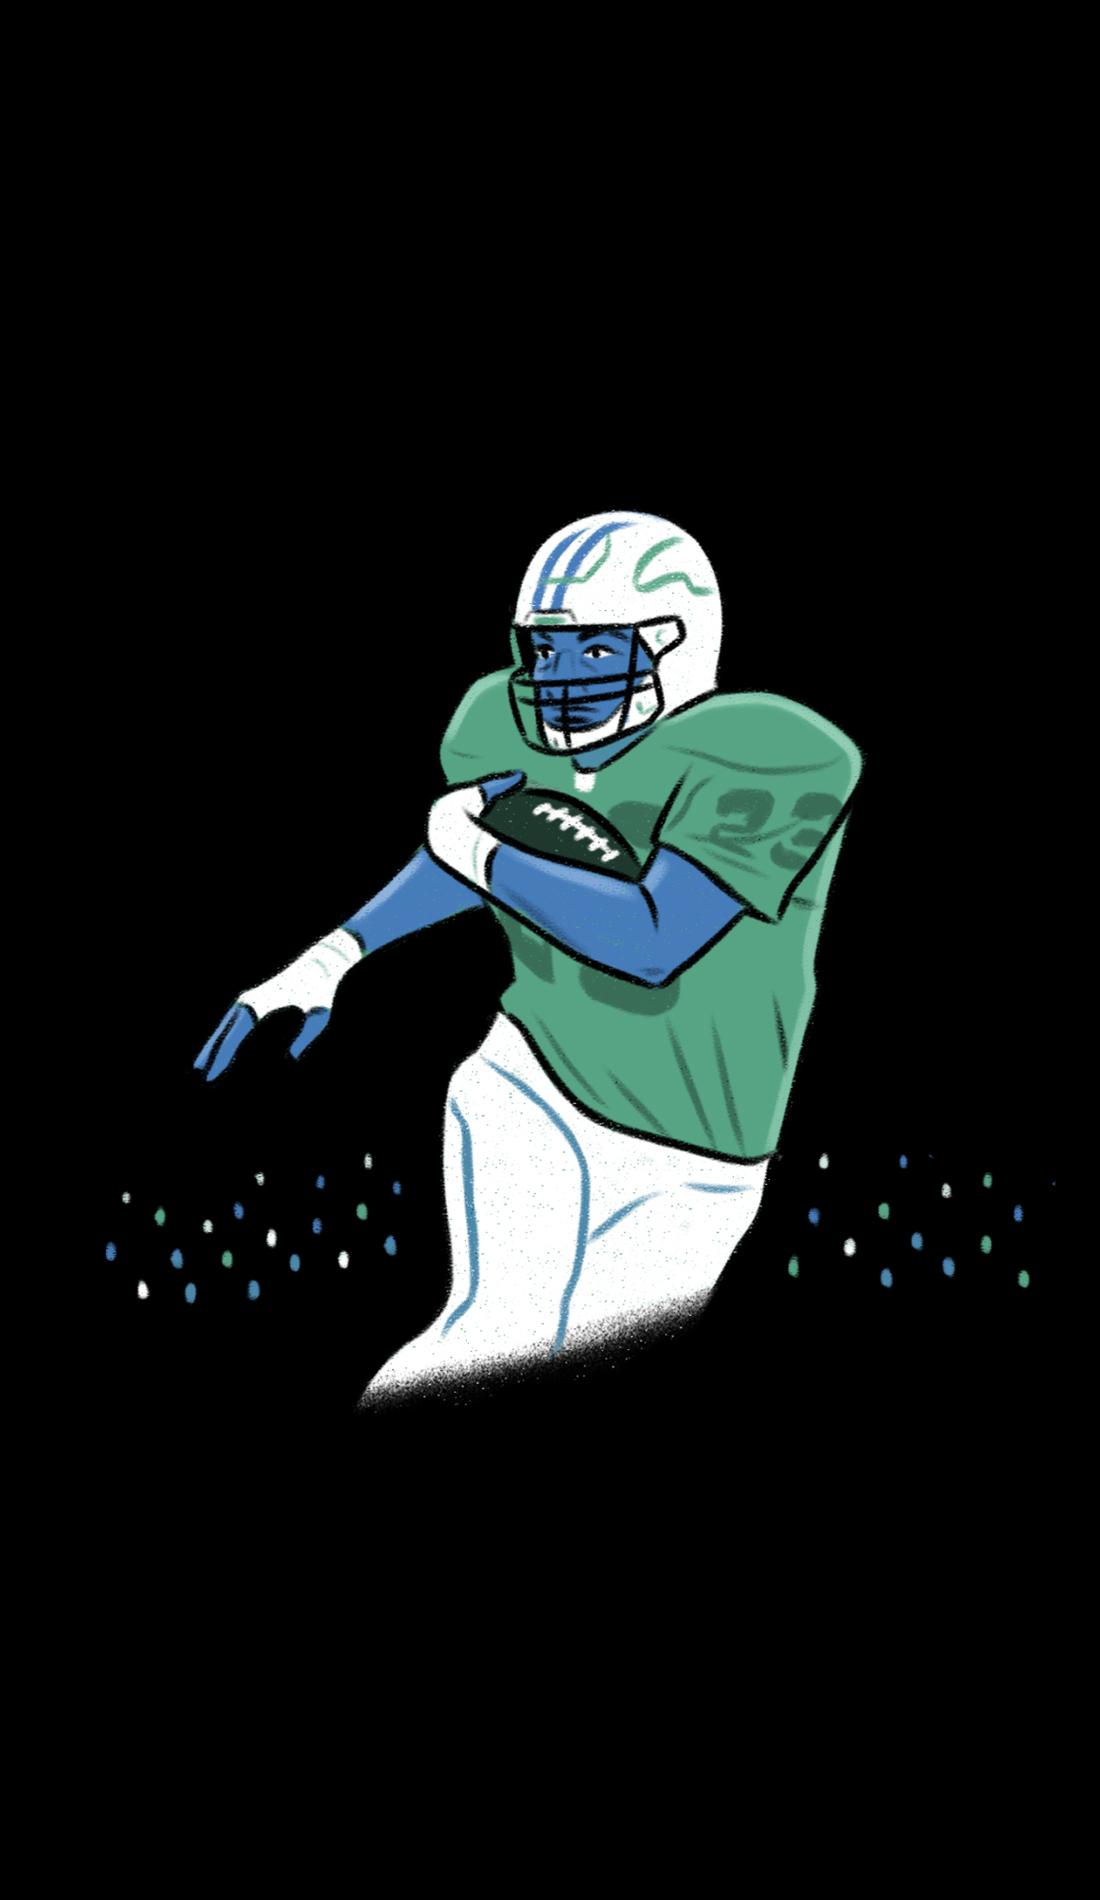 A Louisiana Ragin Cajuns Football live event